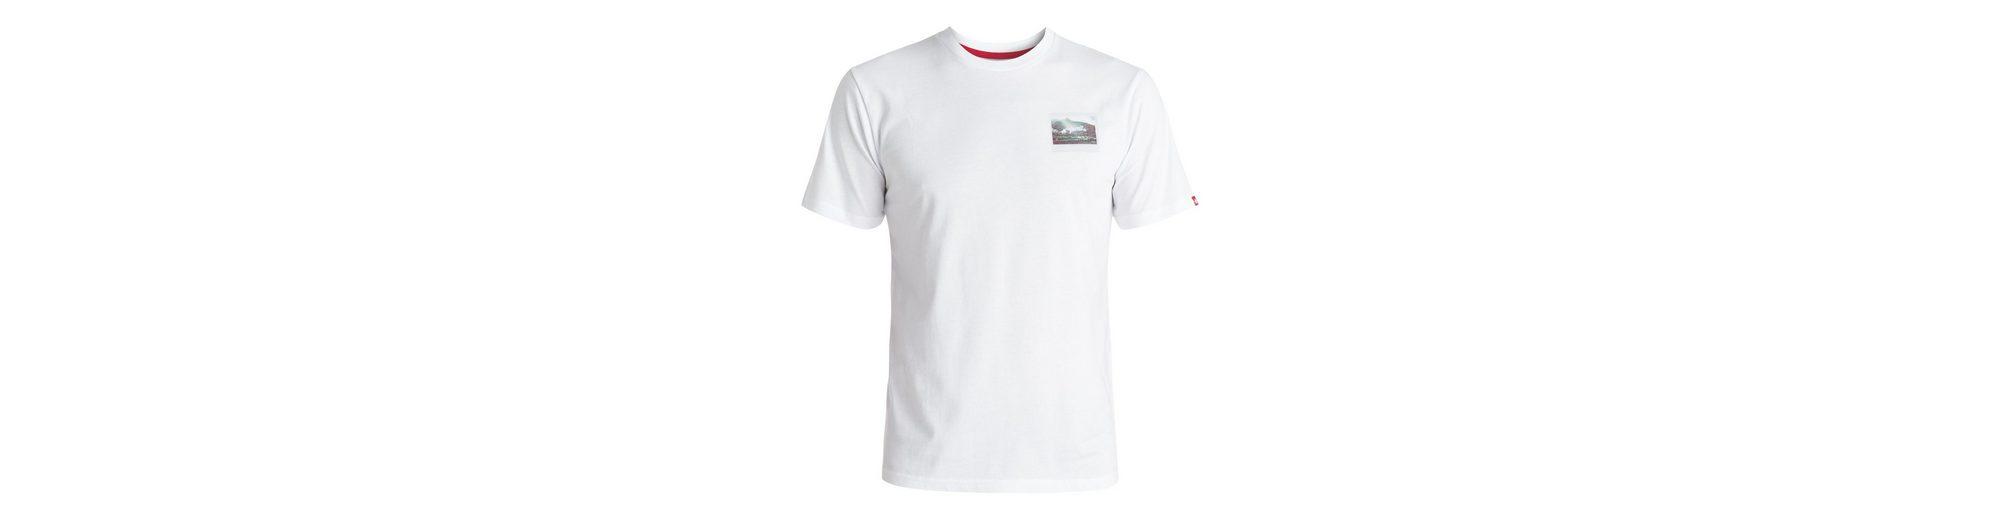 DC Shoes T-Shirt Wes Smile - T-Shirt 2018 Neuer Online-Verkauf 14sCvNP